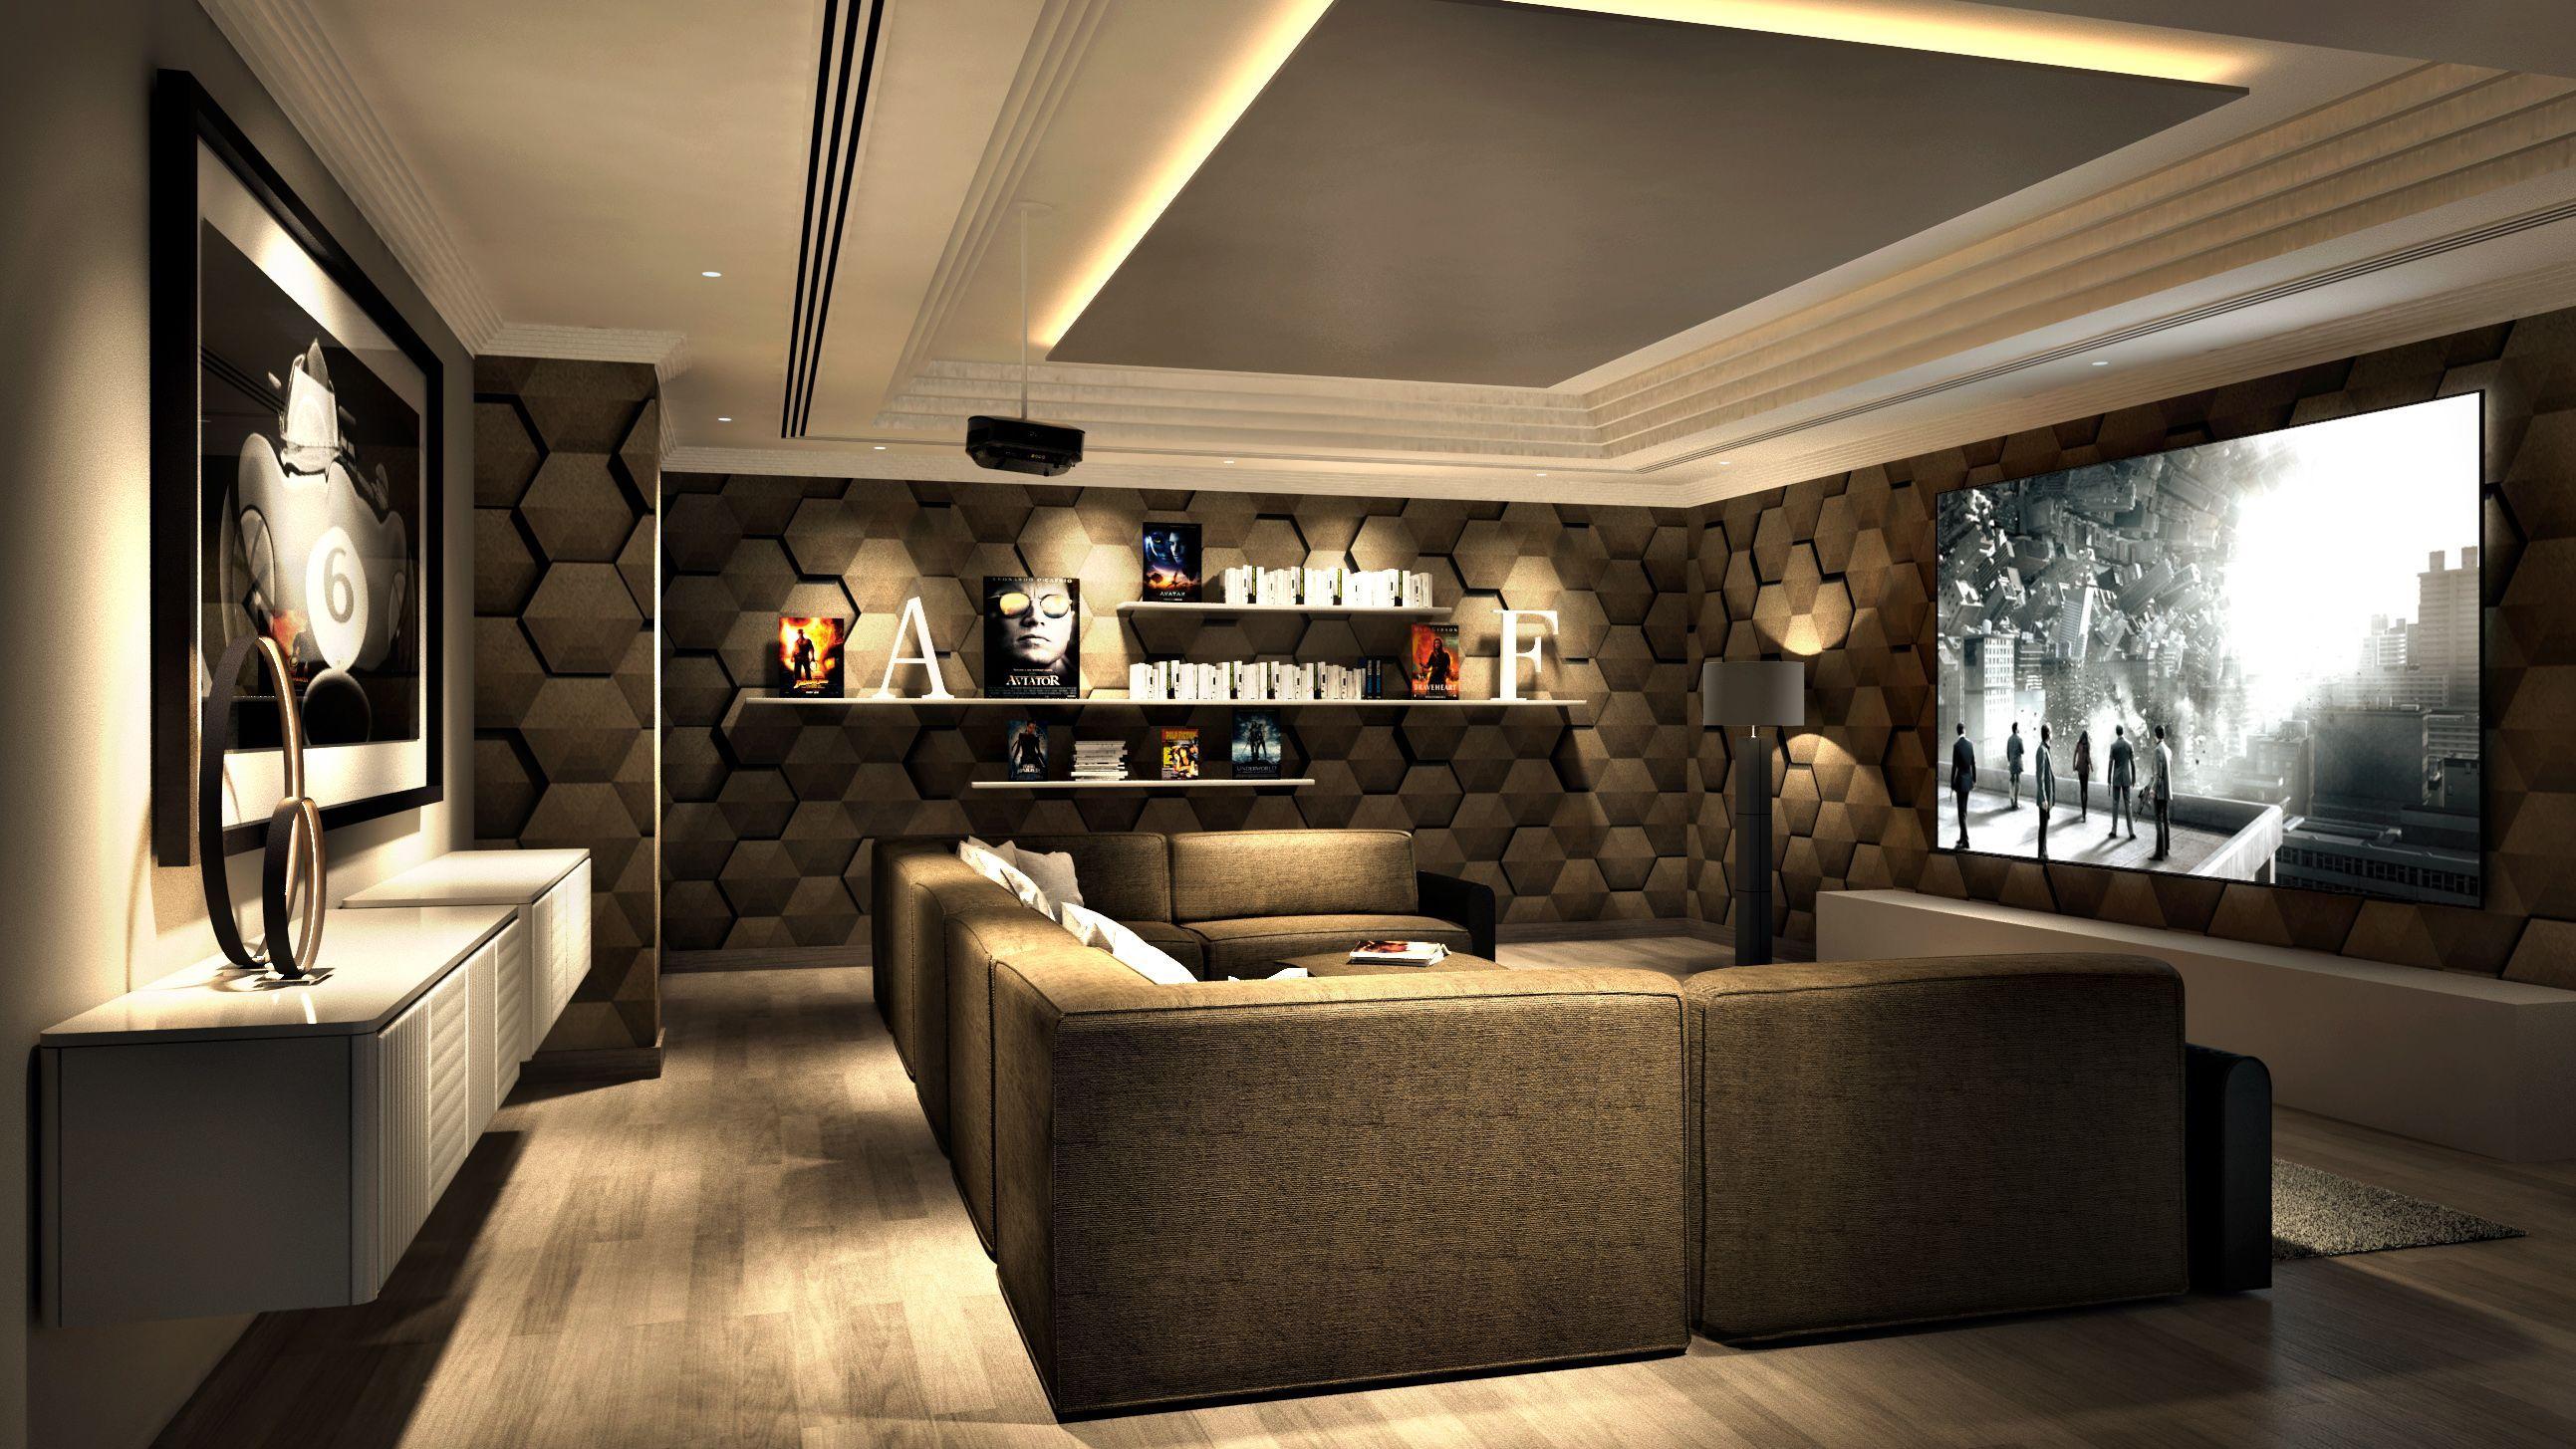 Stunning Home Theater Decorating Design Ideas Home Cinema Room